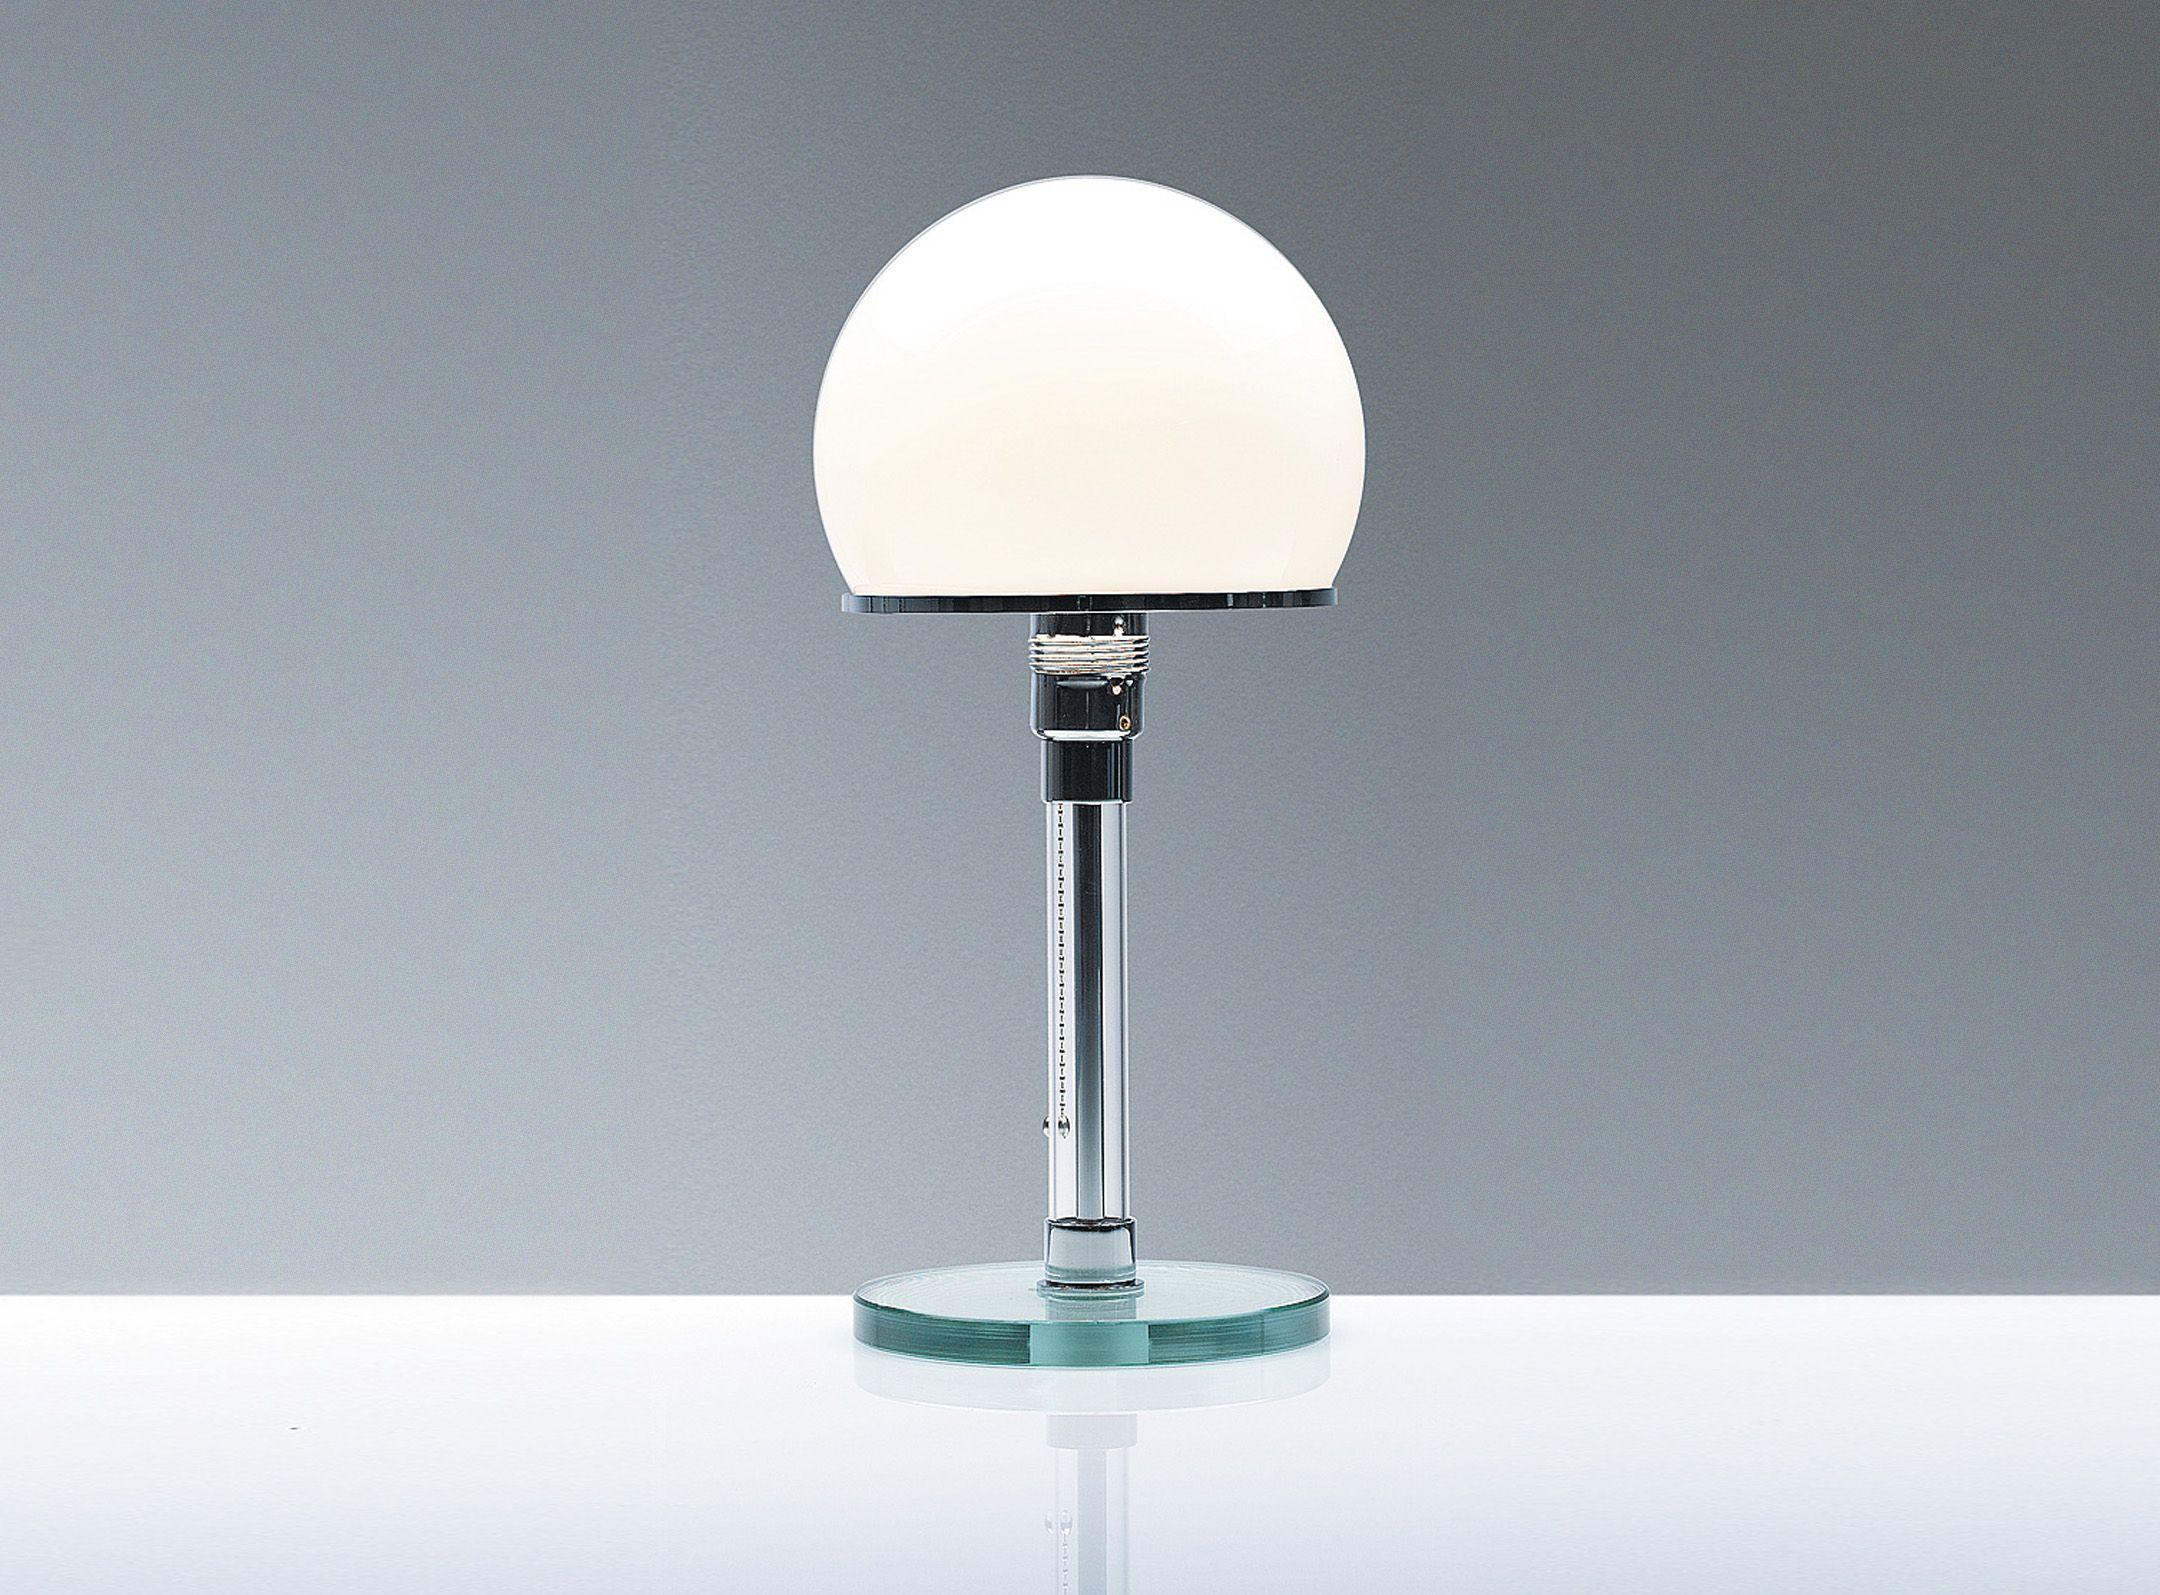 Wilhelm Wagenfeld lampe de chevet 1923 24 Bauhaus